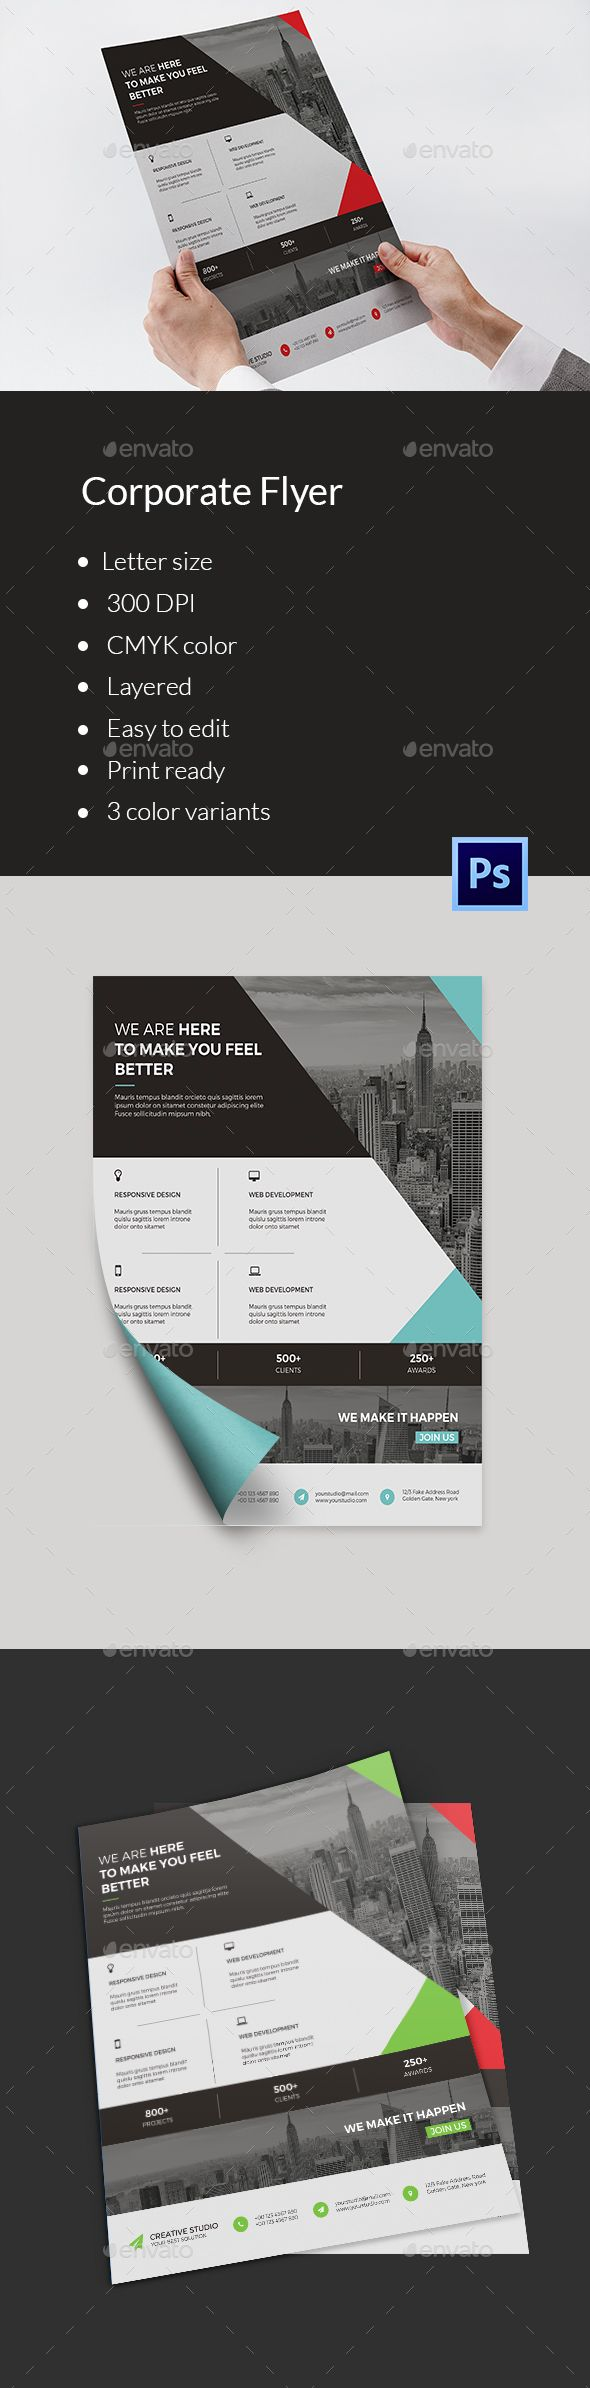 Business Flyer Template V137 614 best Corporate Flyer